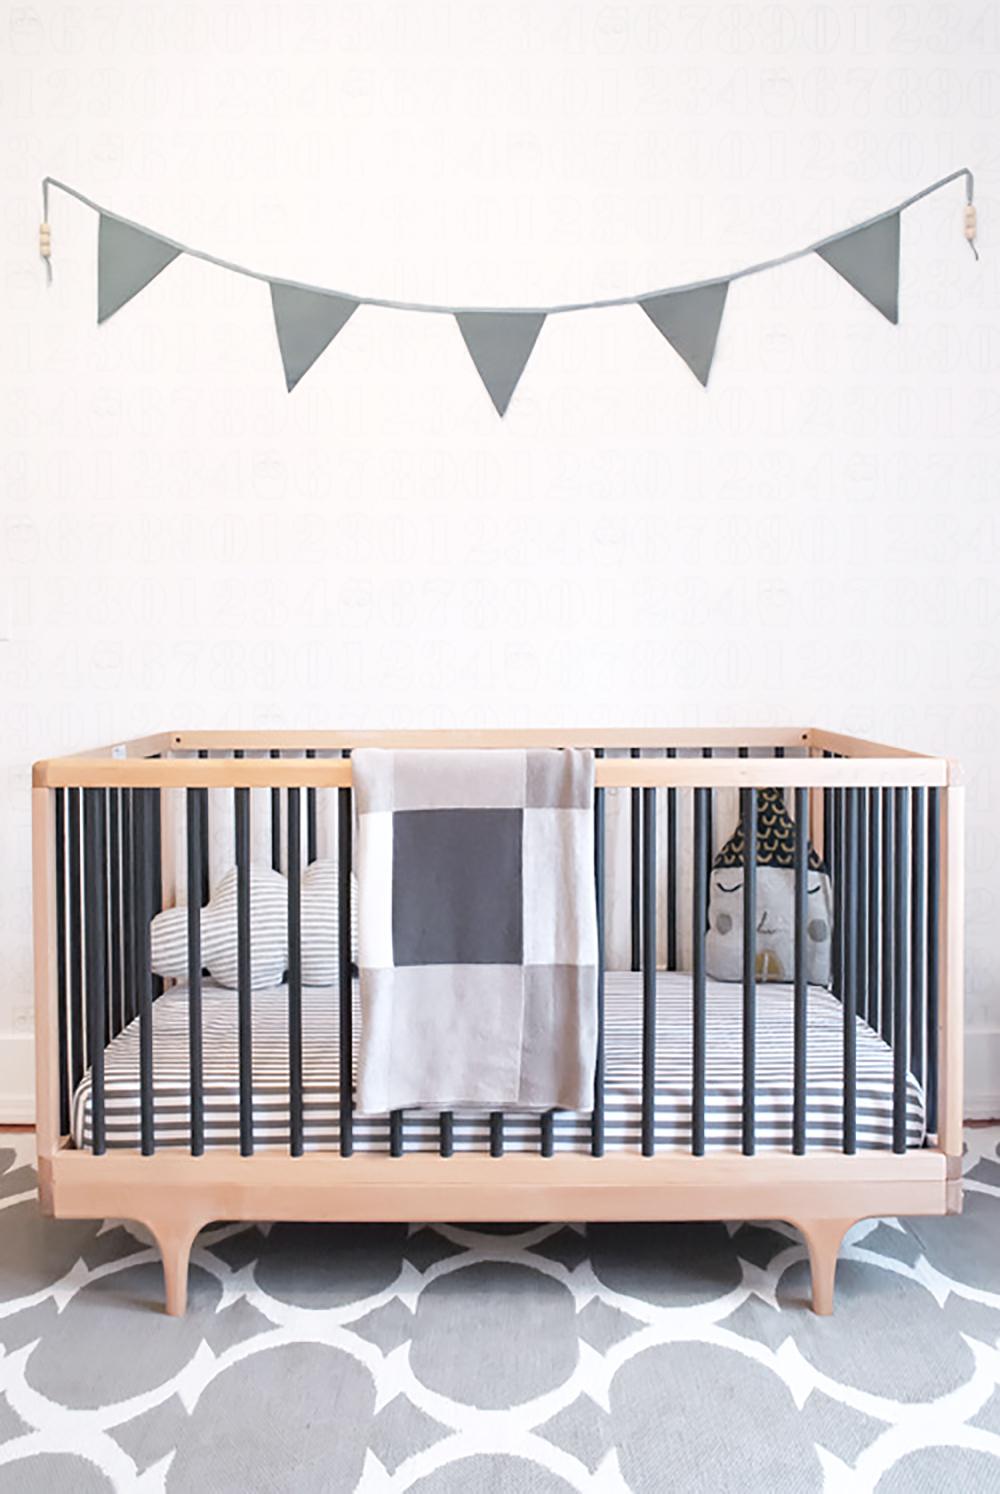 Caravan Crib in interior designer Melissa Barling's children's room